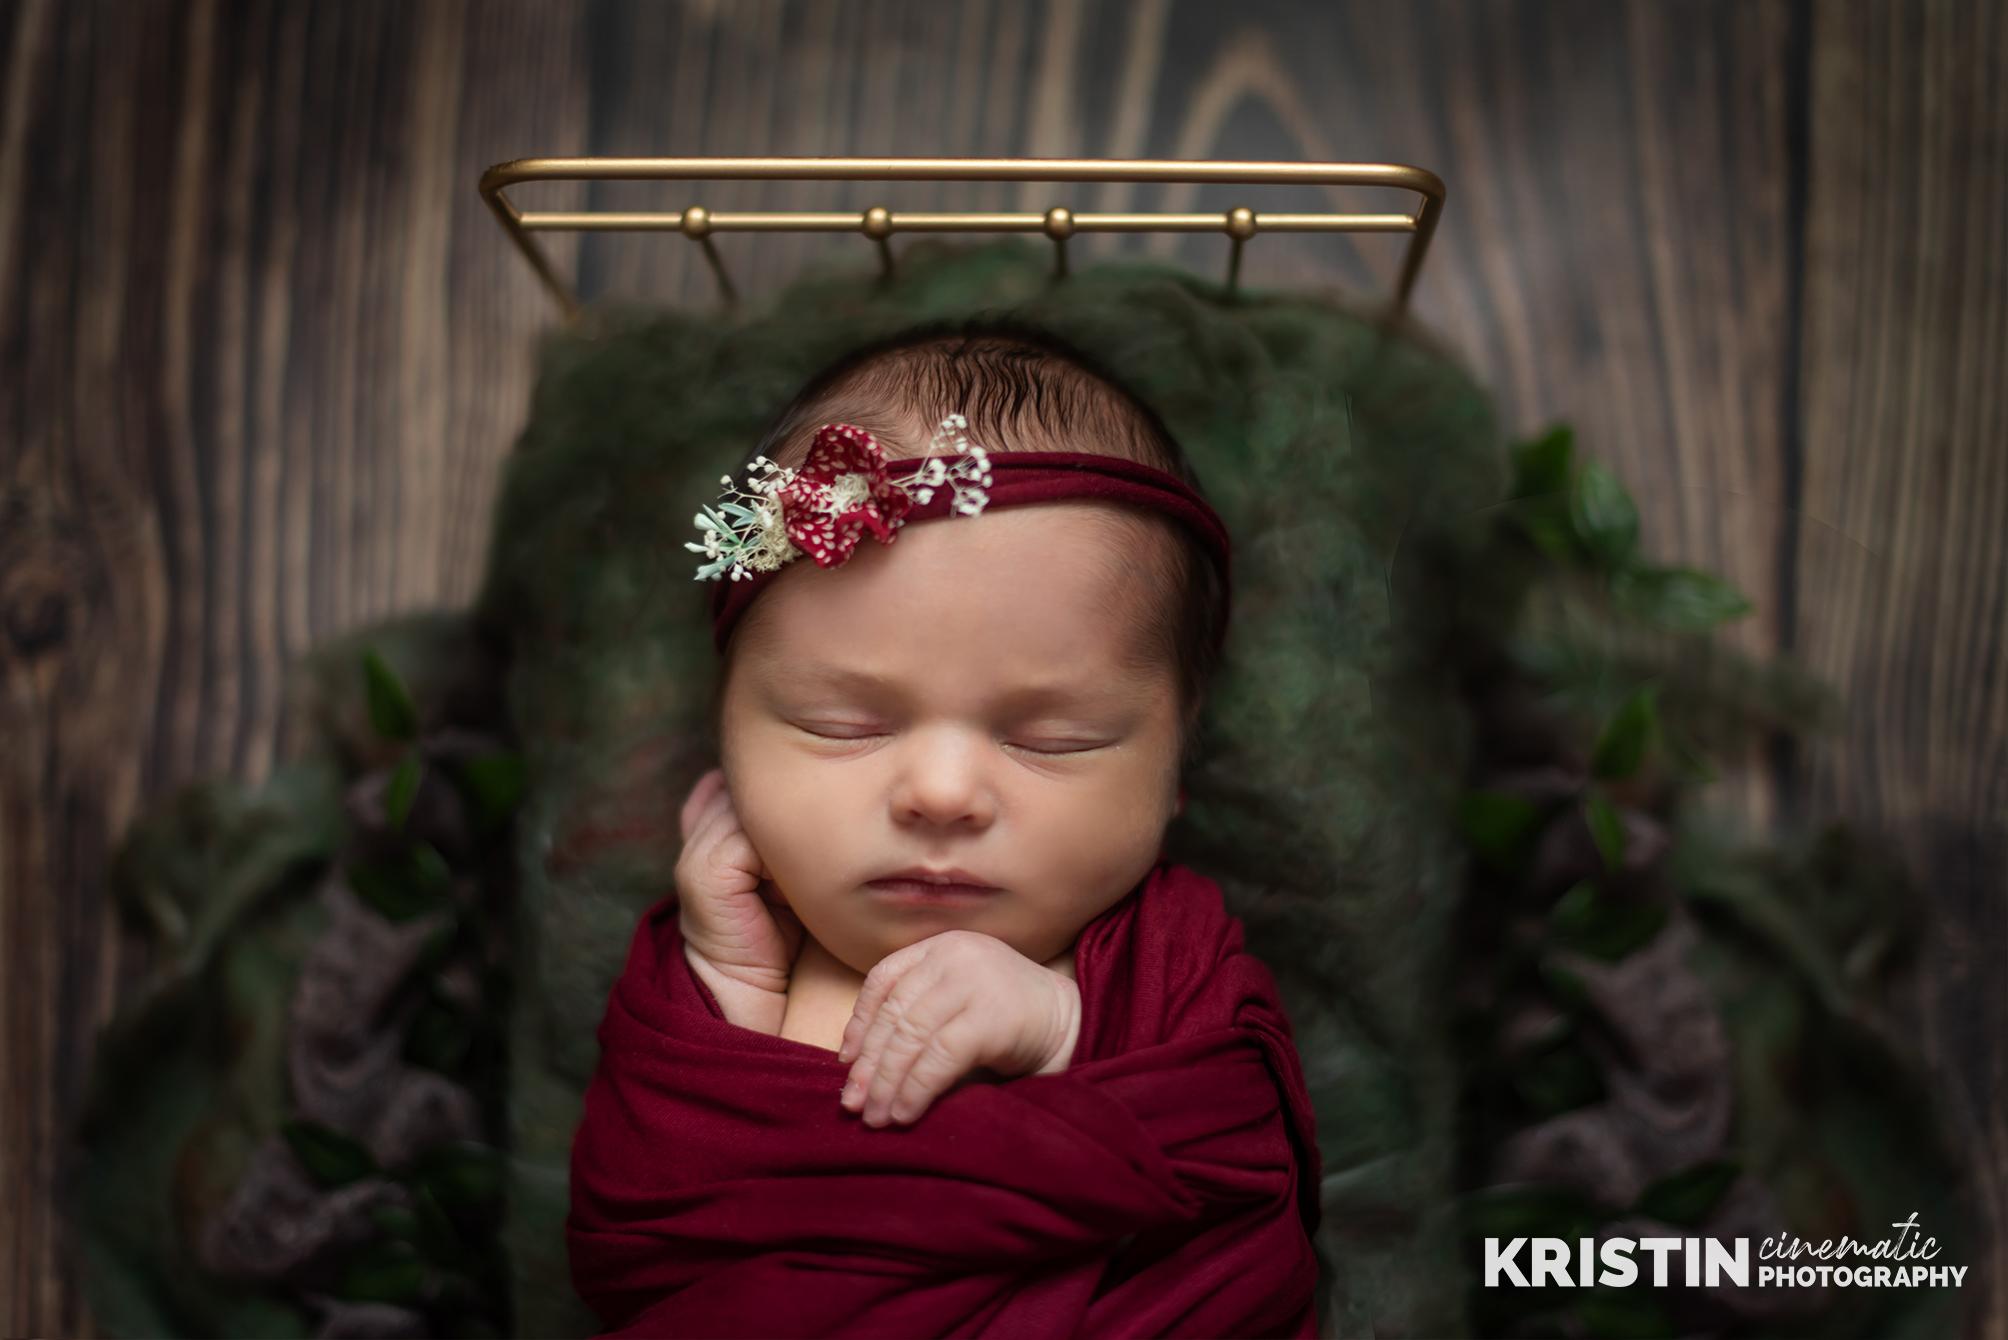 Kristin - Photography 3c.jpg